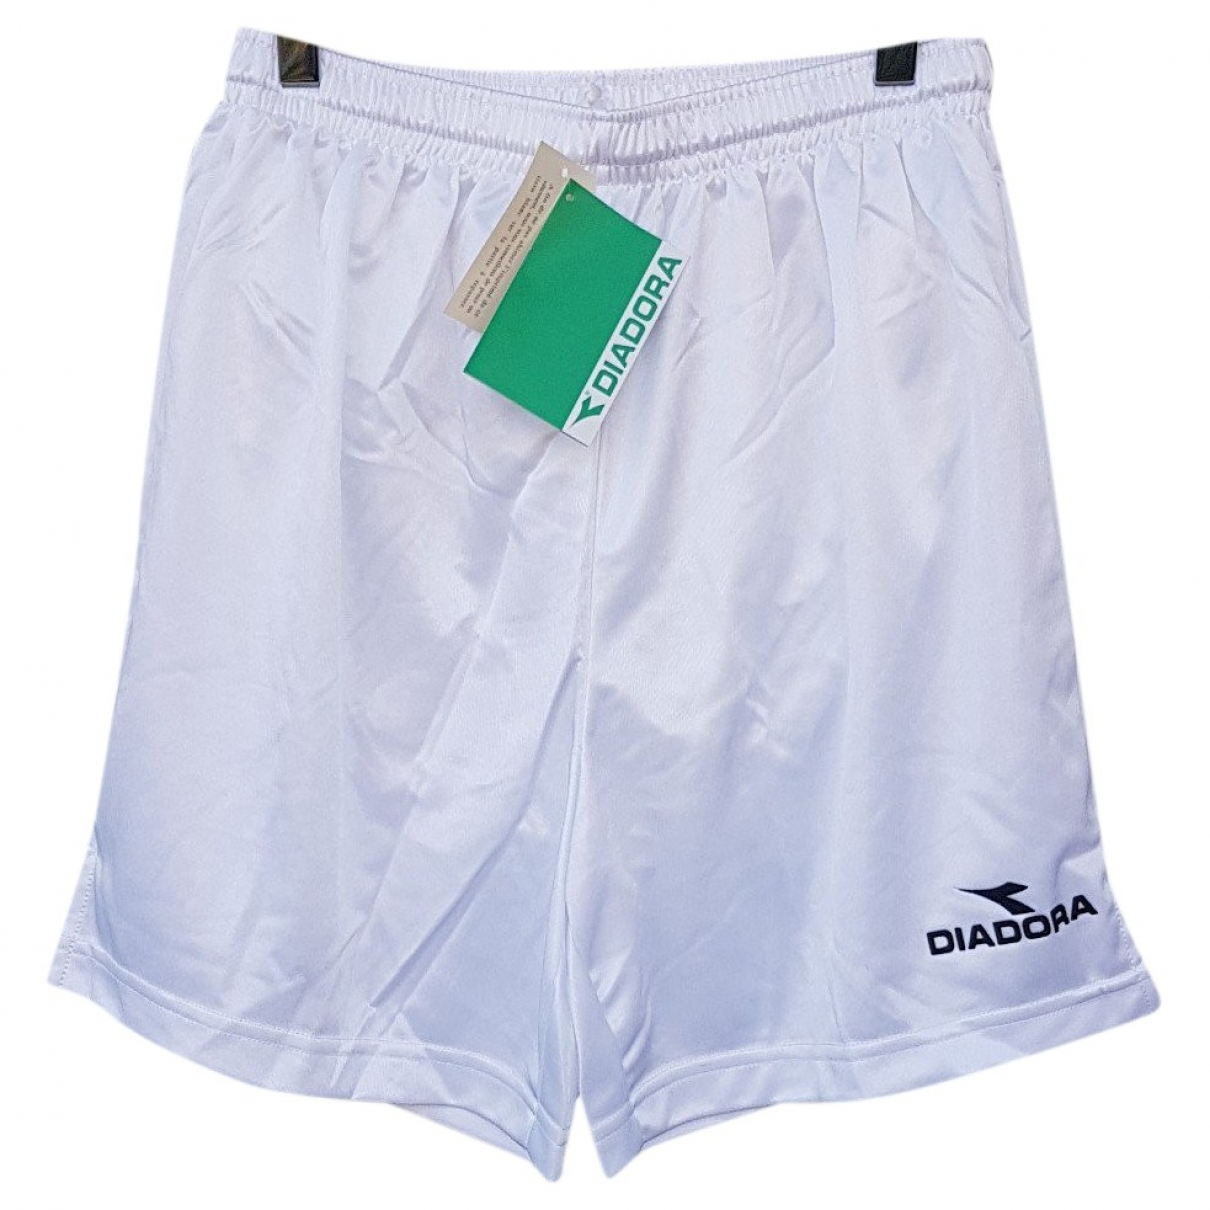 Diadora \N White Shorts for Men L International